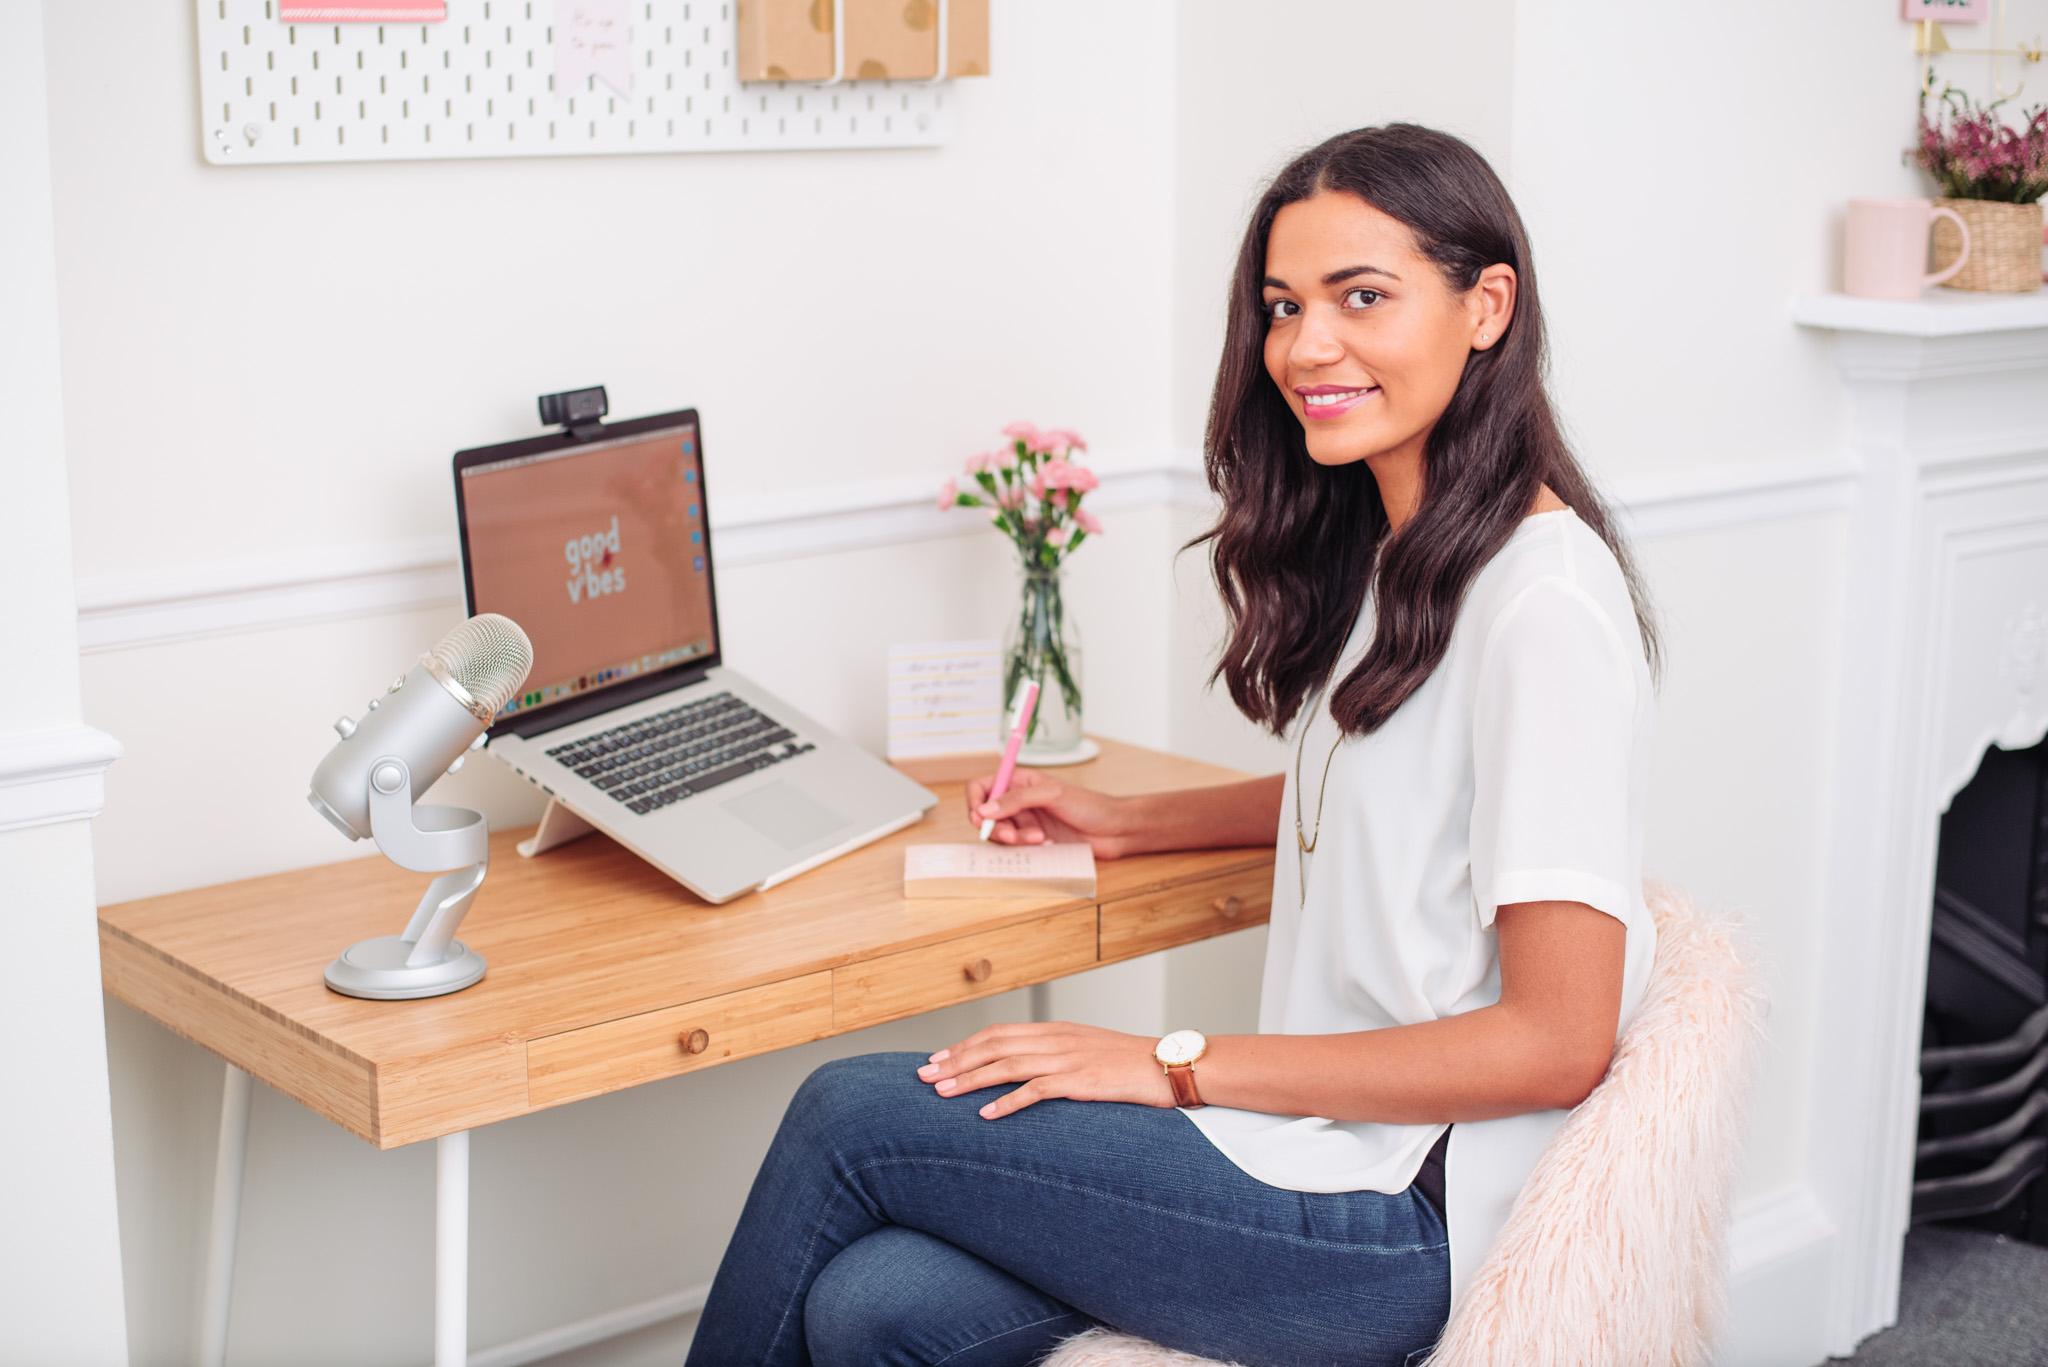 Nesha-Woolery-Business-Mentor-Designers-Web-71.jpg